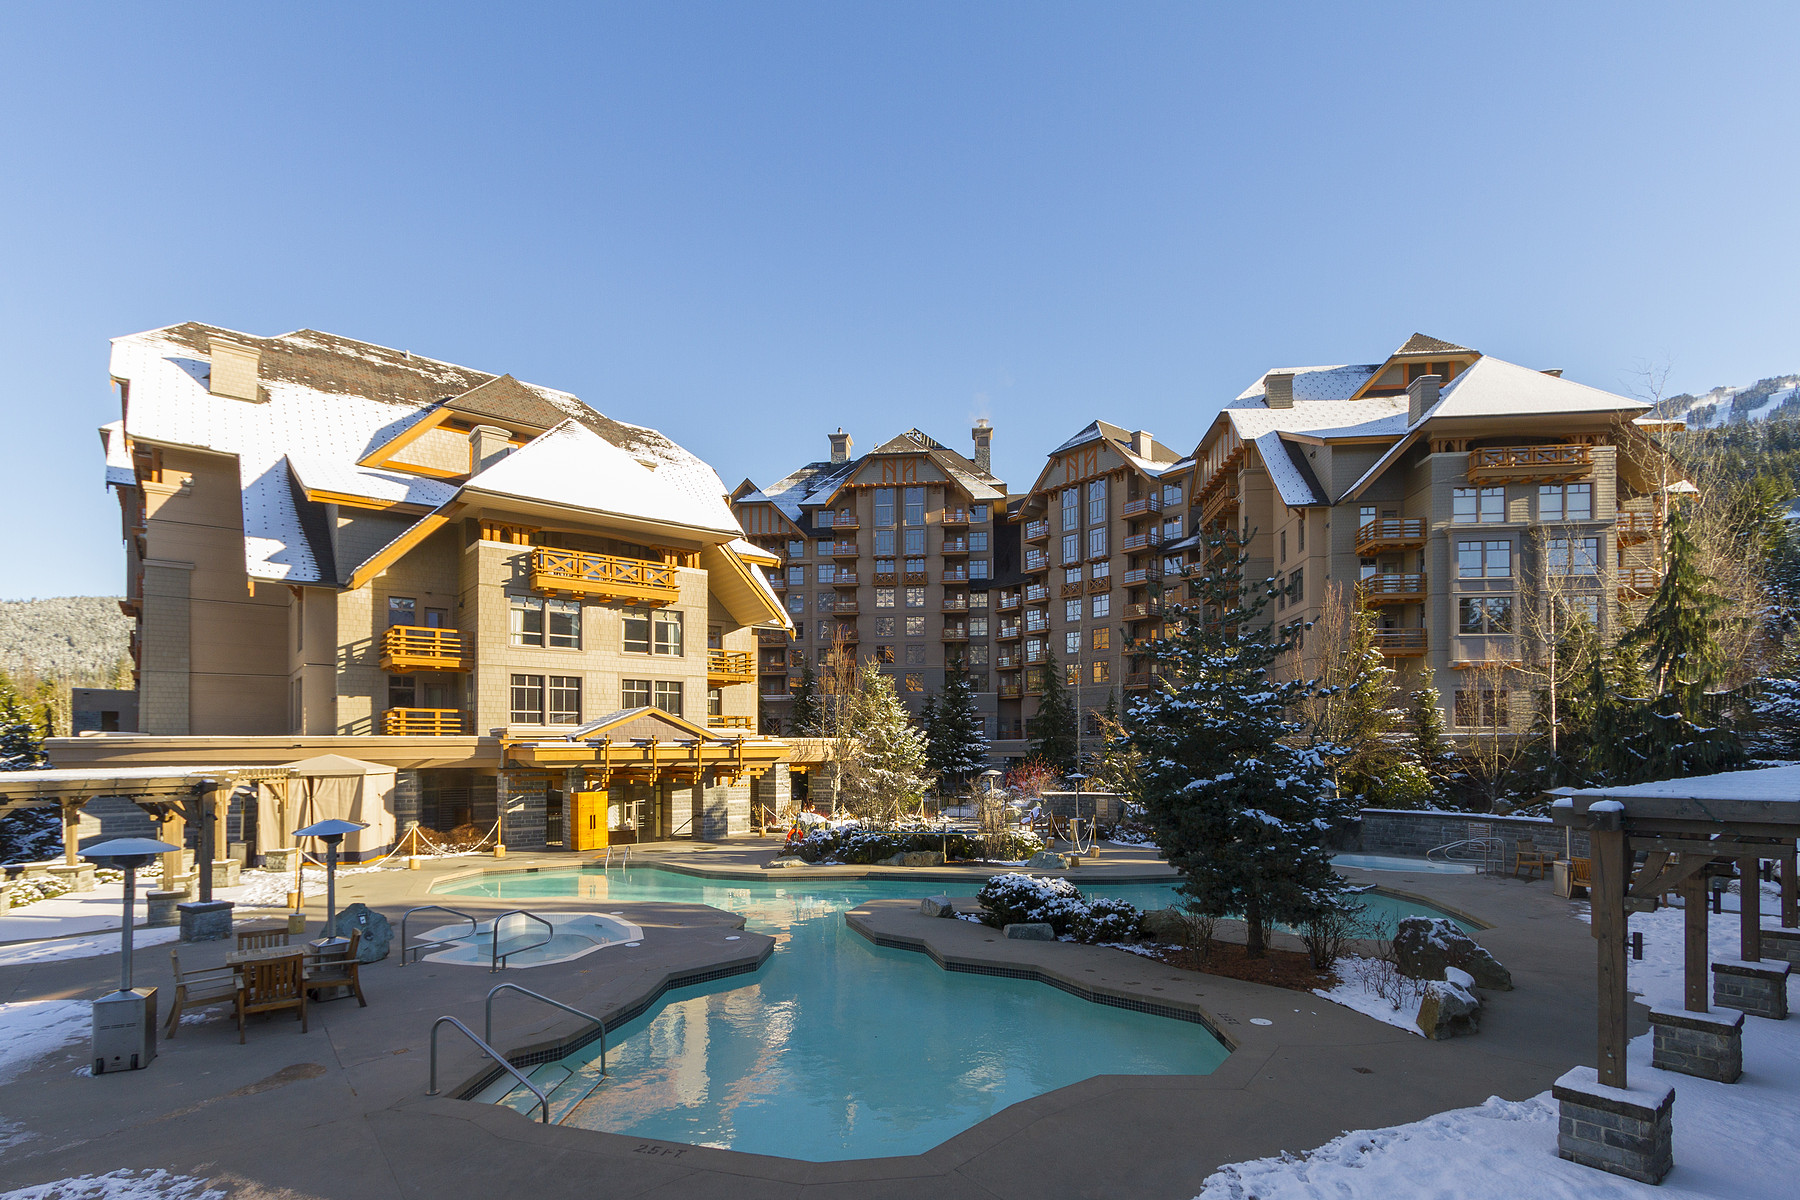 Condominium for Sale at Four Seasons Resort Whistler 255 4591 Blackcomb Way Whistler, British Columbia, V0N 1B4 Canada